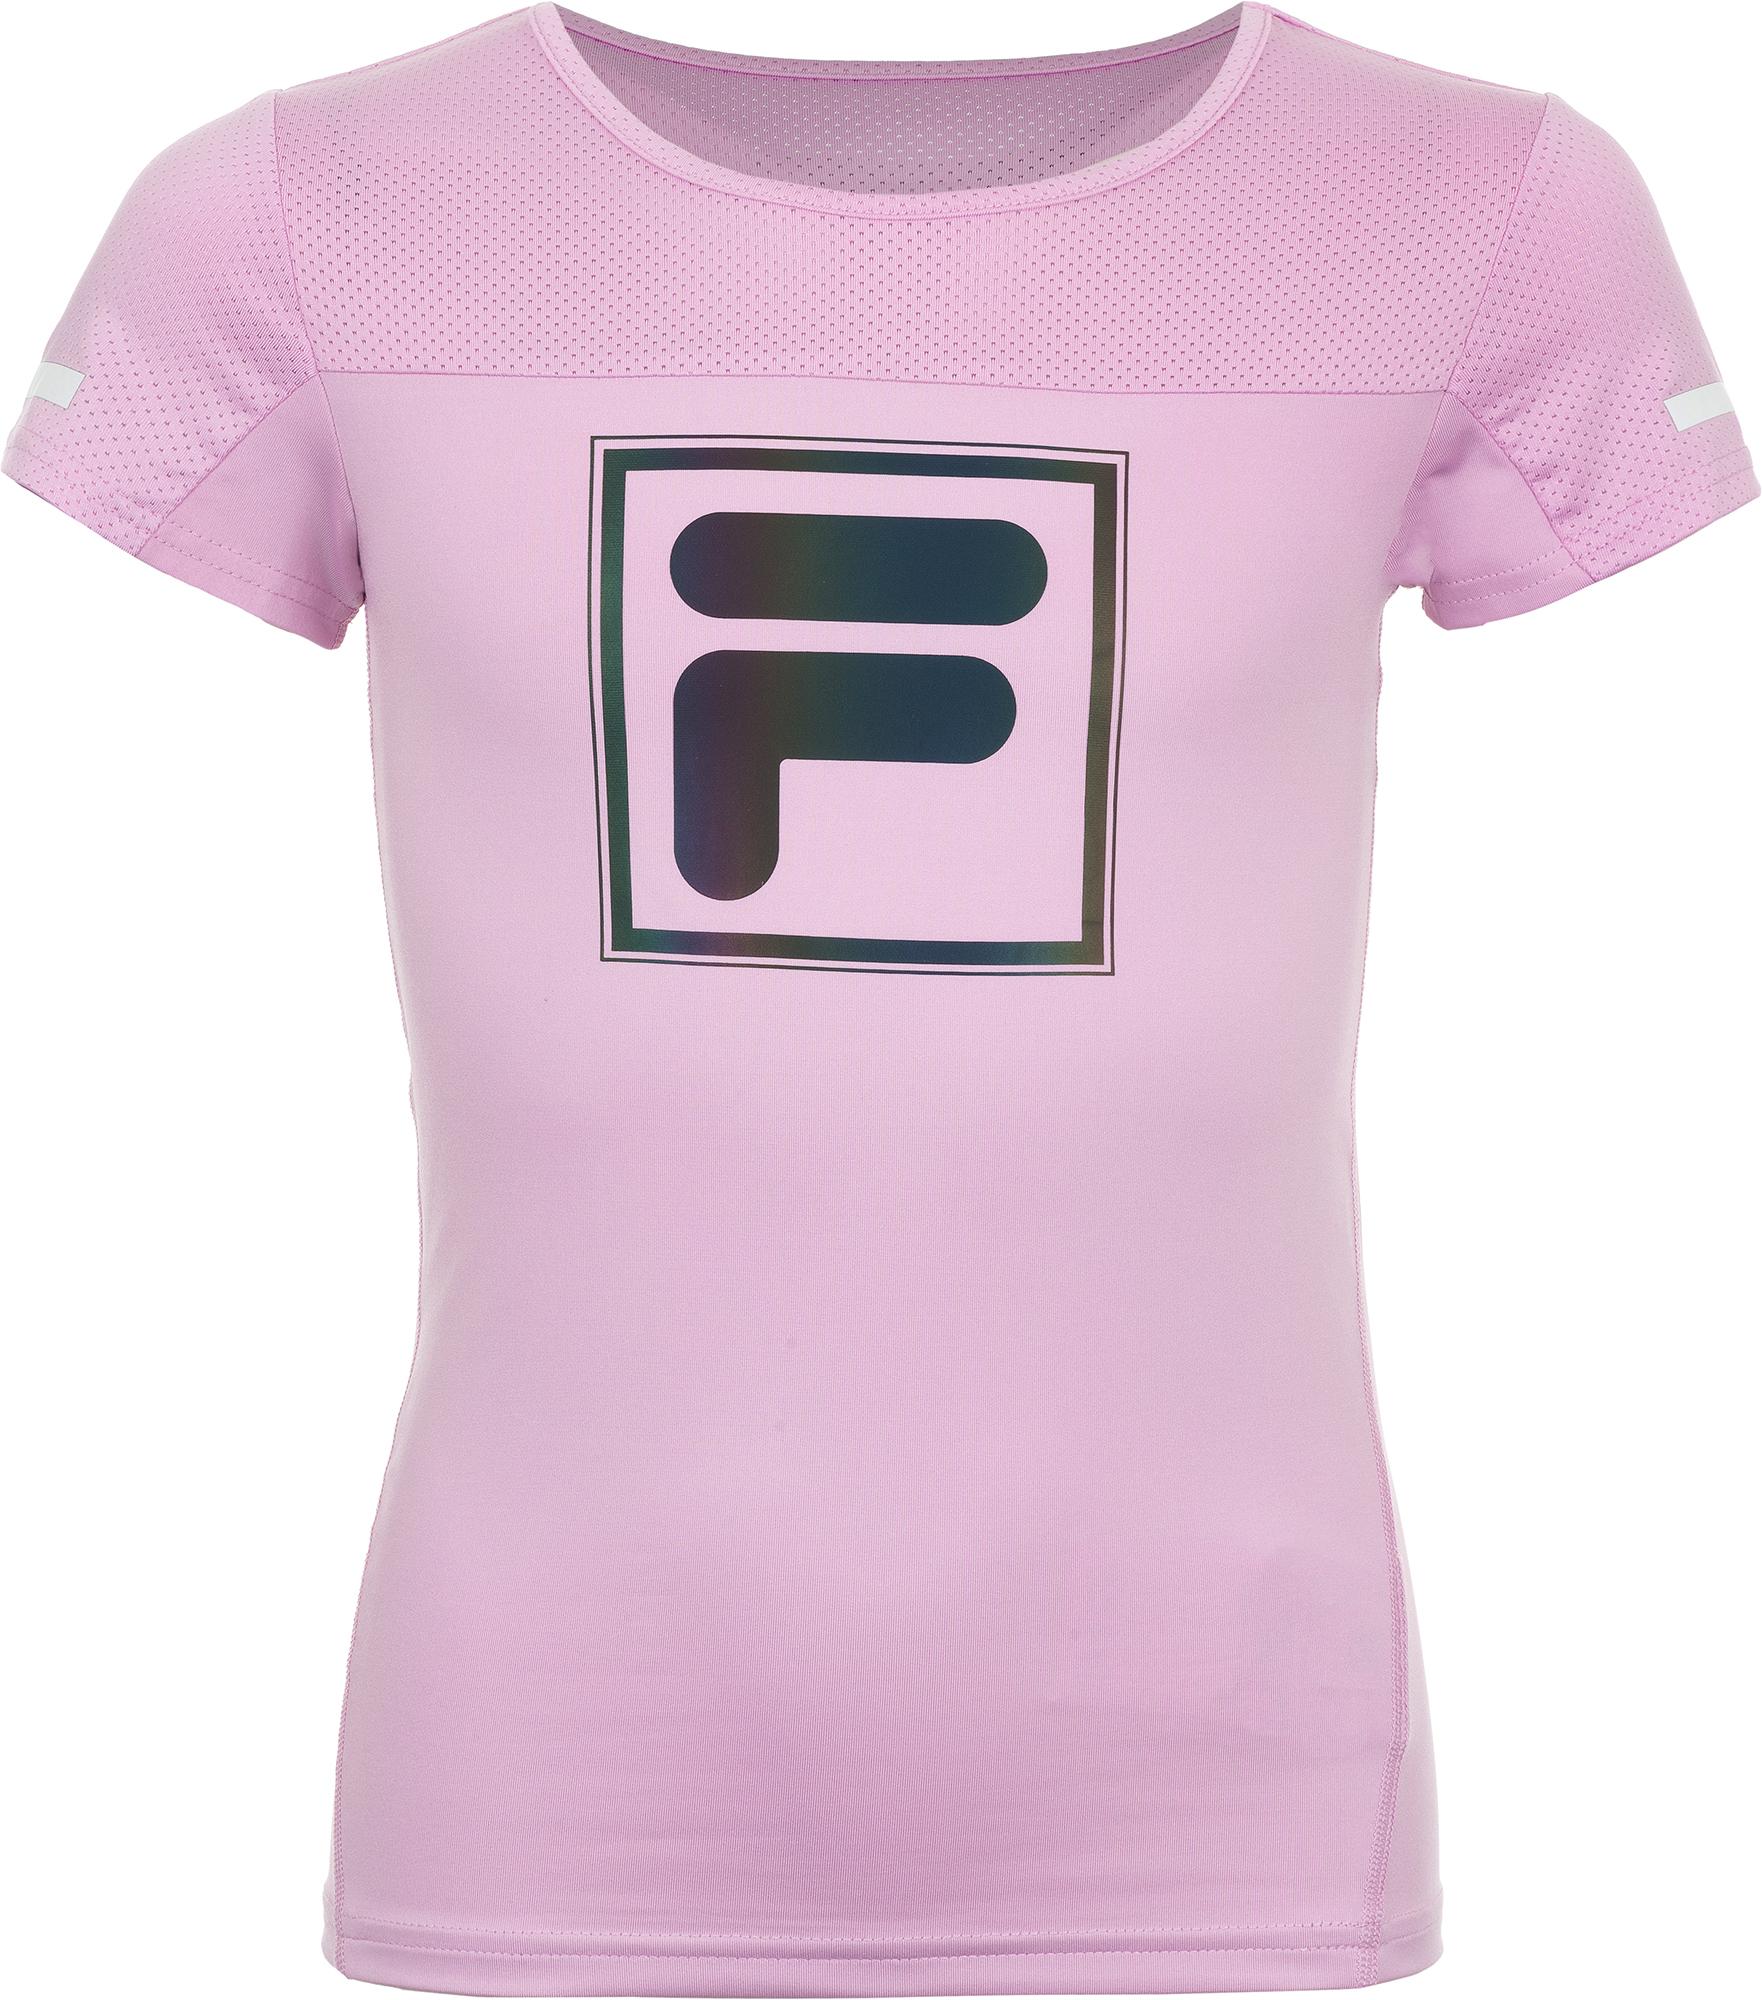 Fila Футболка для девочек Fila, размер 128 спортивная футболка fila